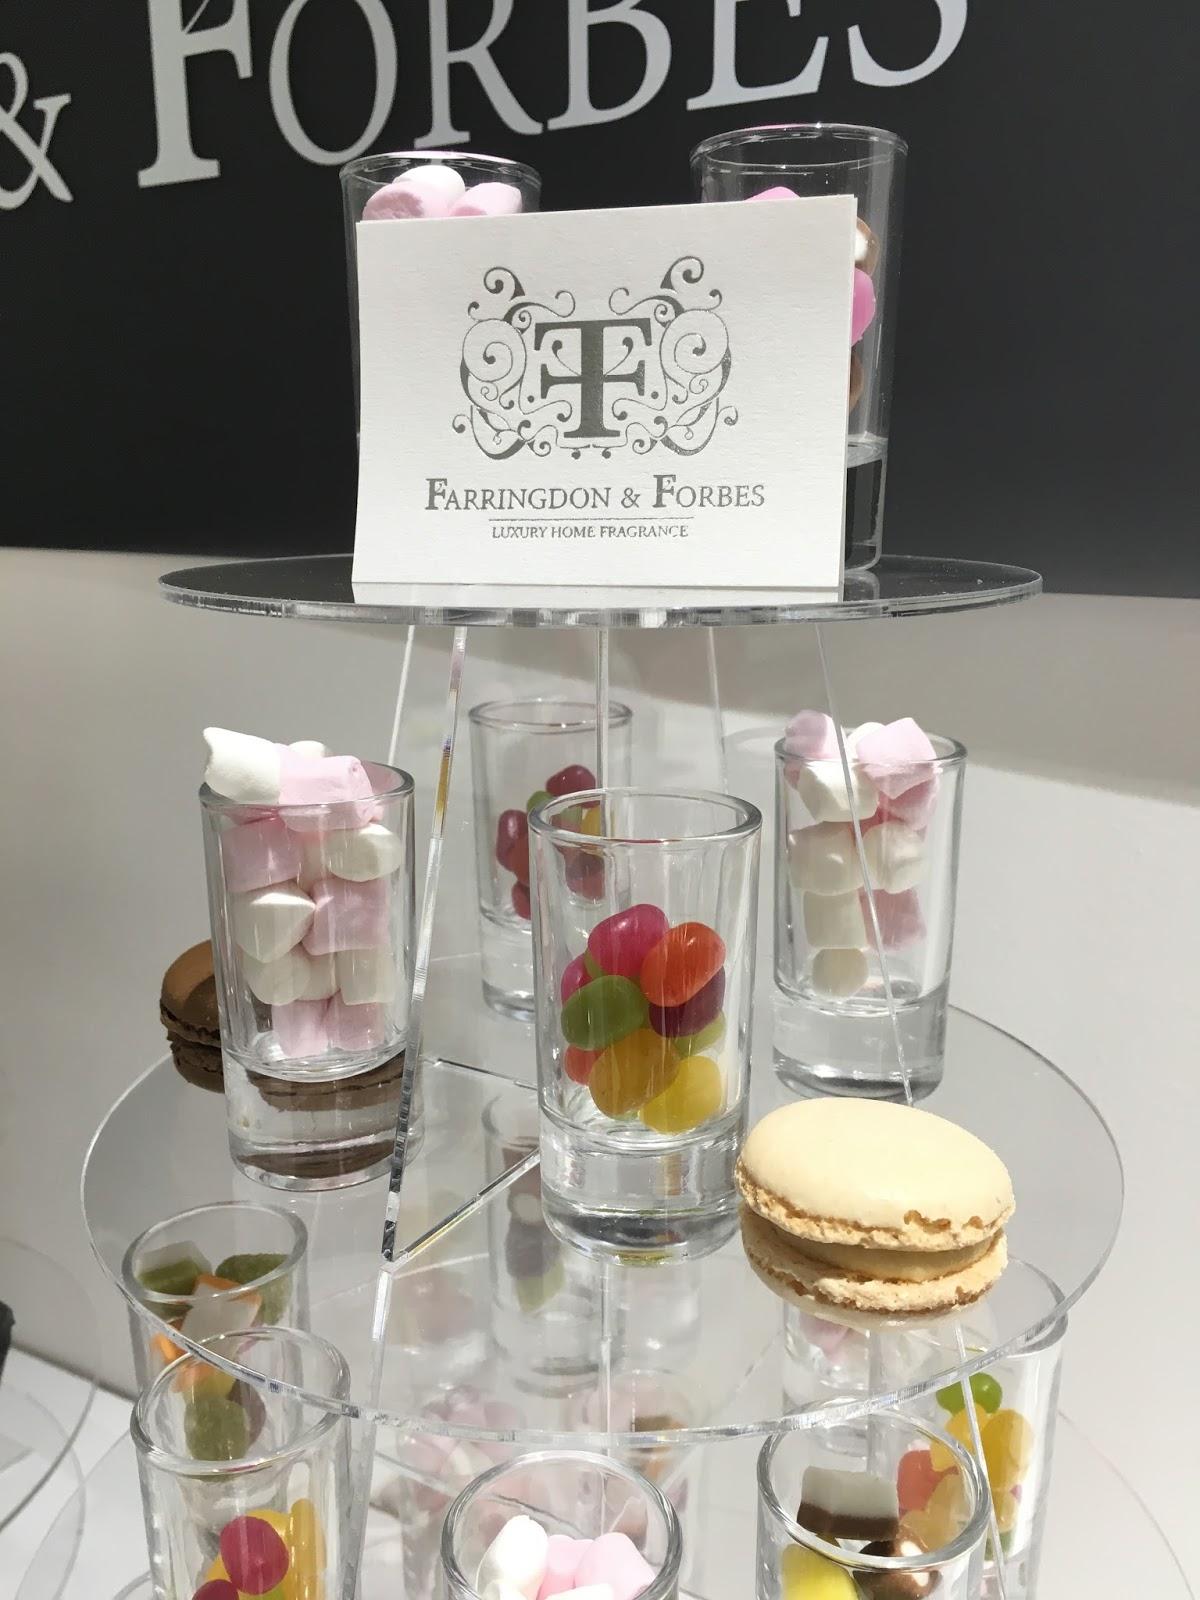 Farringdon & Forbes, luxury home fragrance, candles, Birmingham